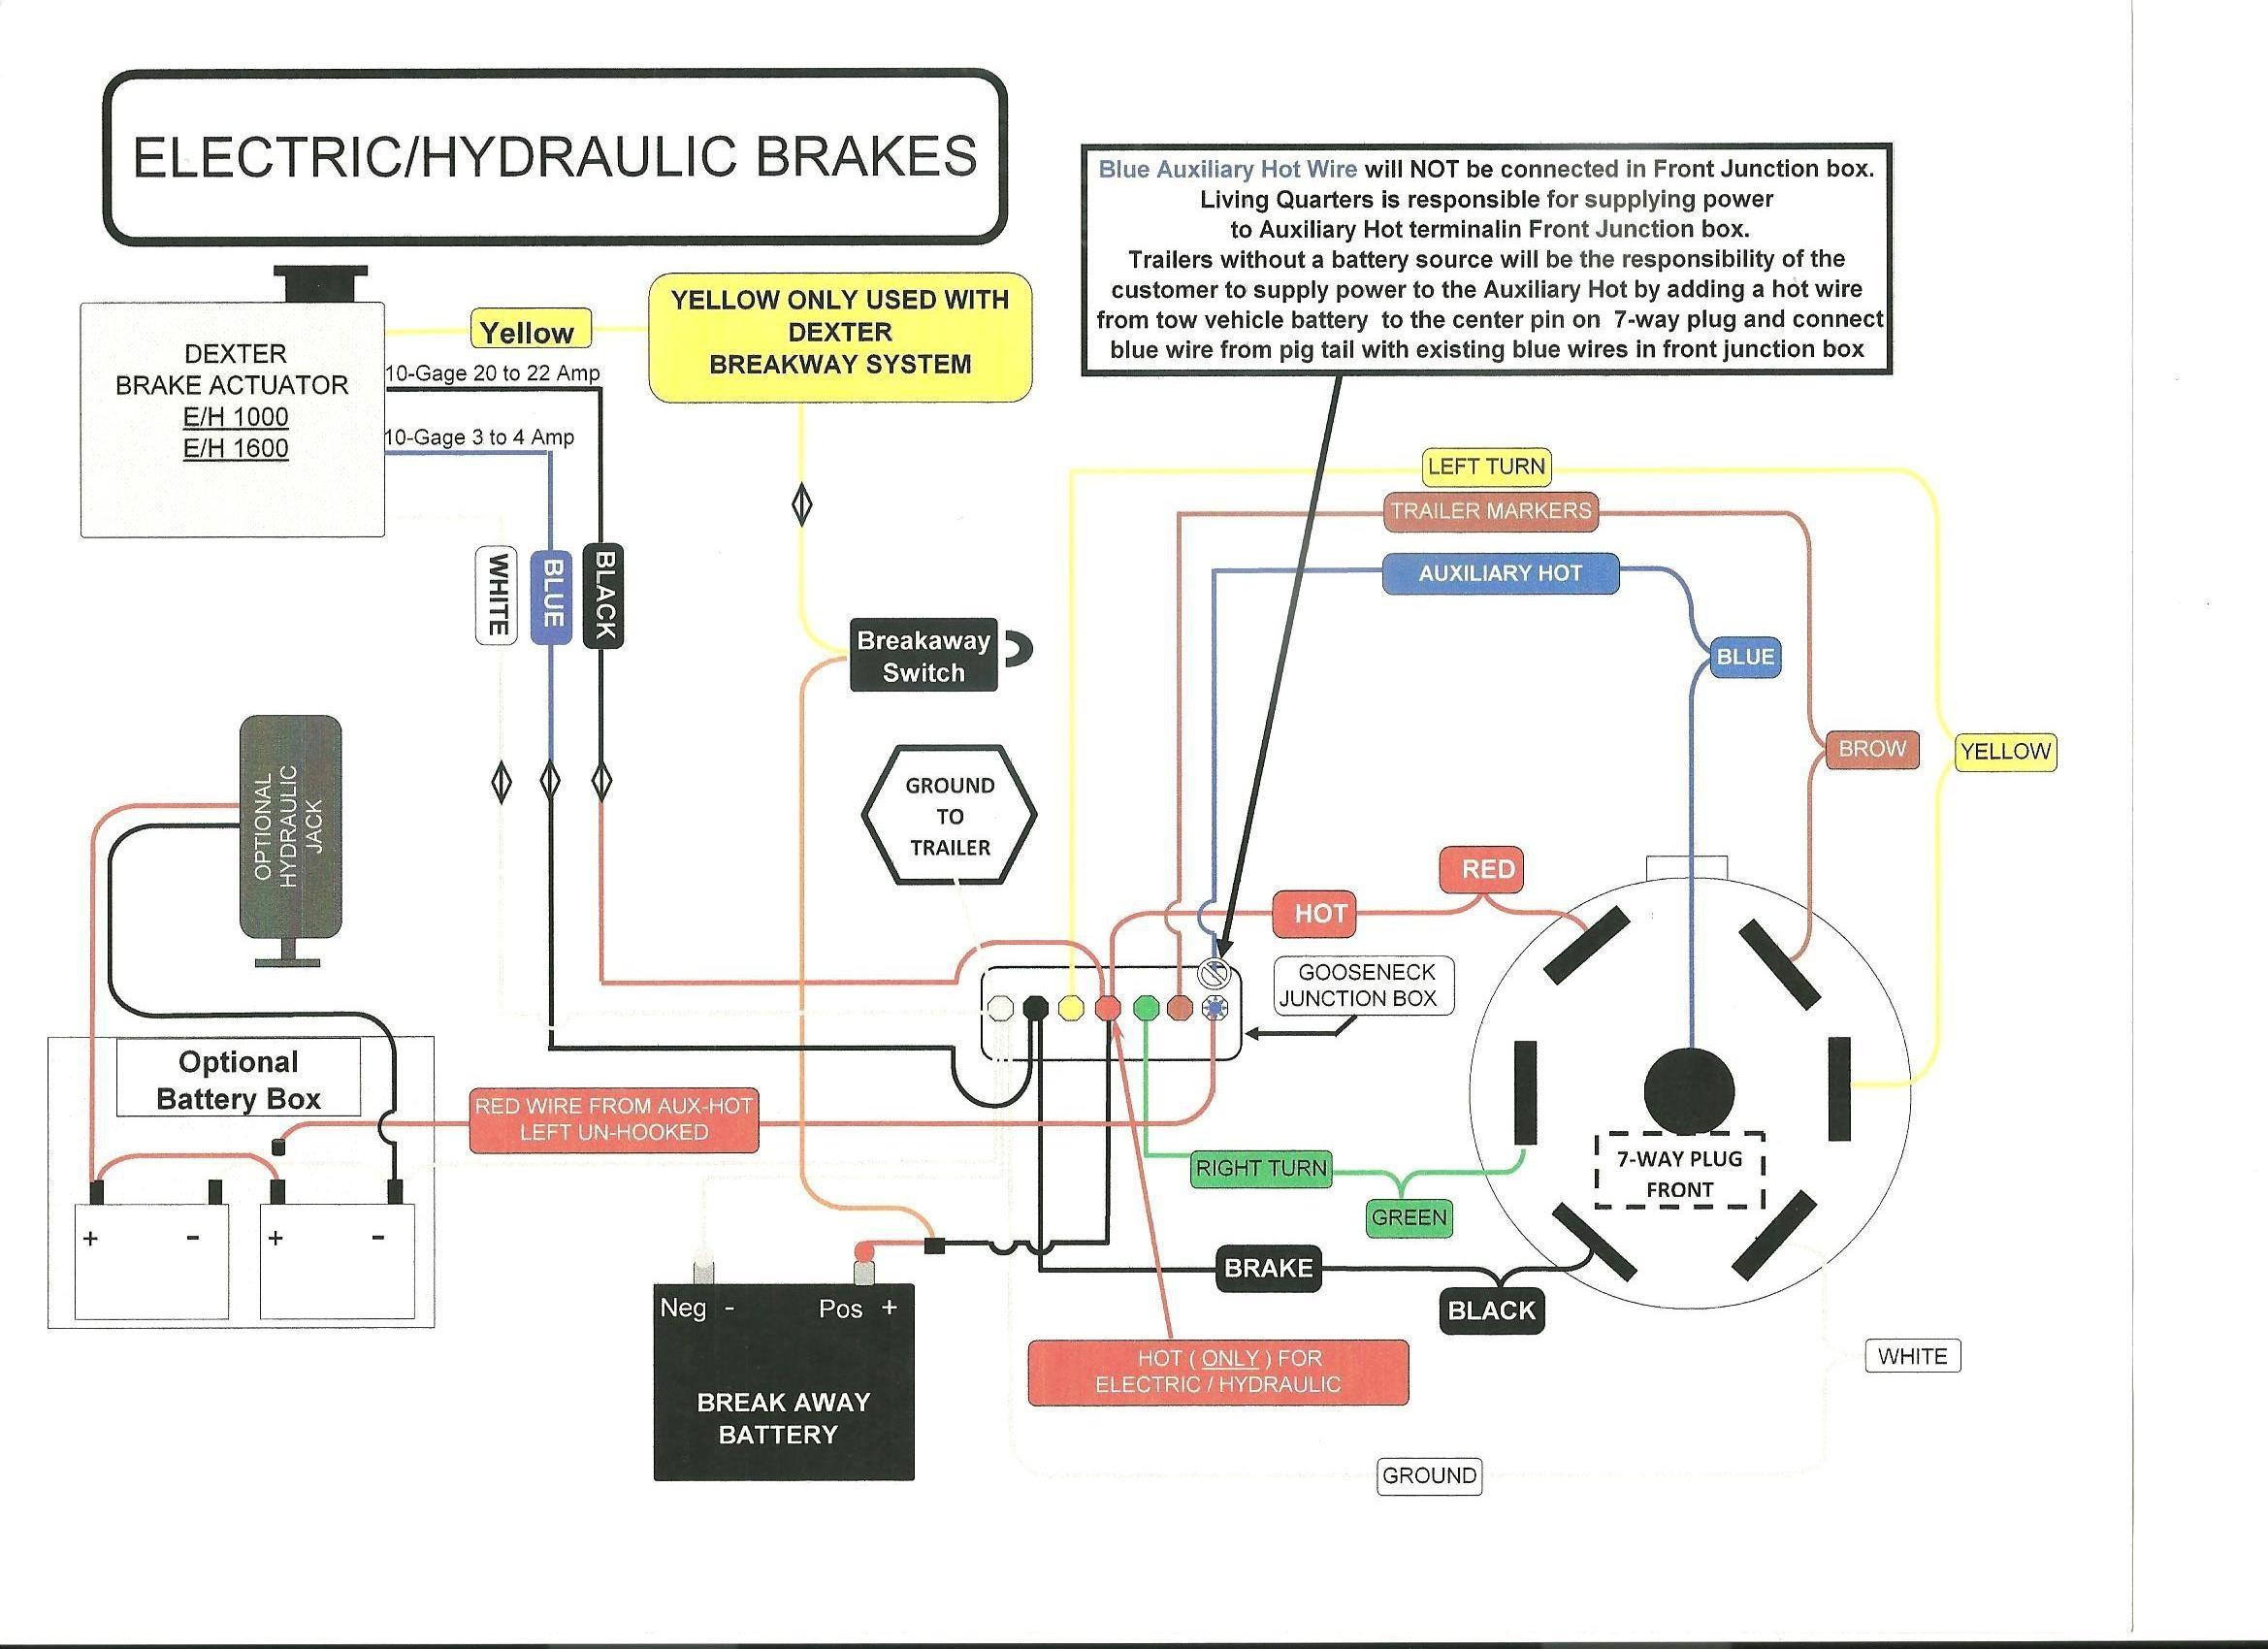 Australian Trailer Plug Wiring Diagram 7 Way Valid Wiring Diagram for Australian Trailers New 5 Way